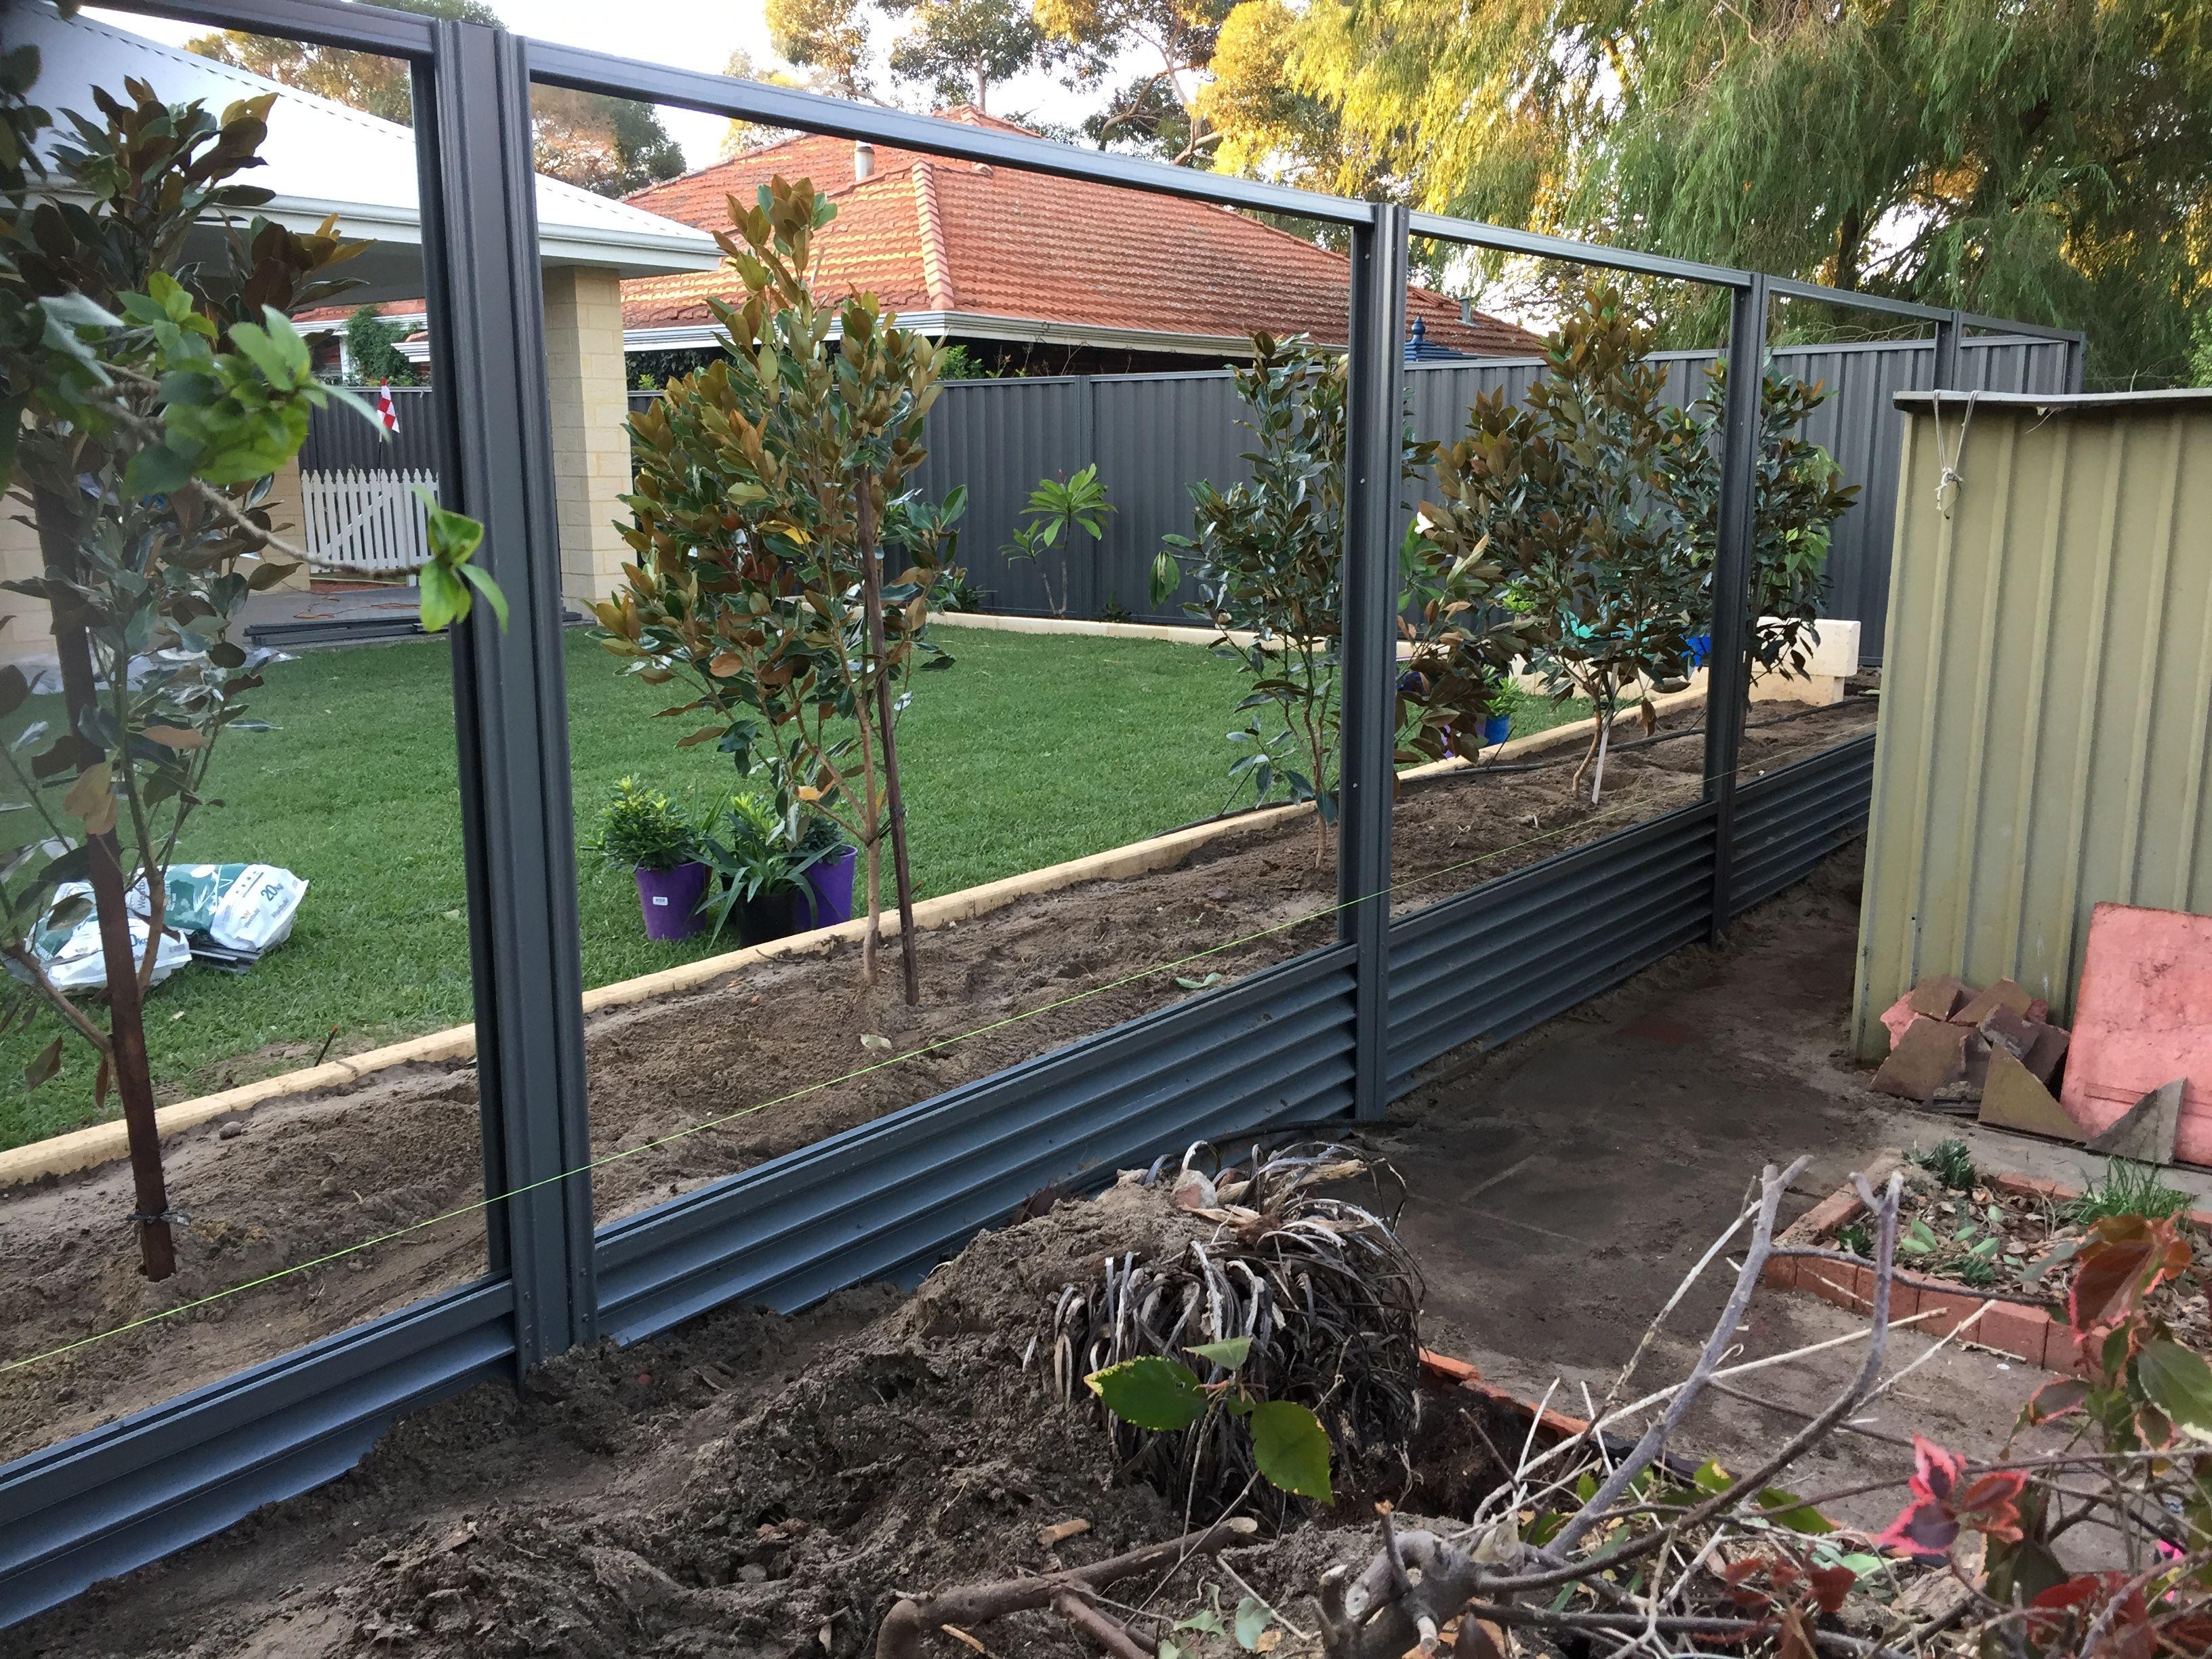 colorbond steel fencing install using gramline plinths underneath